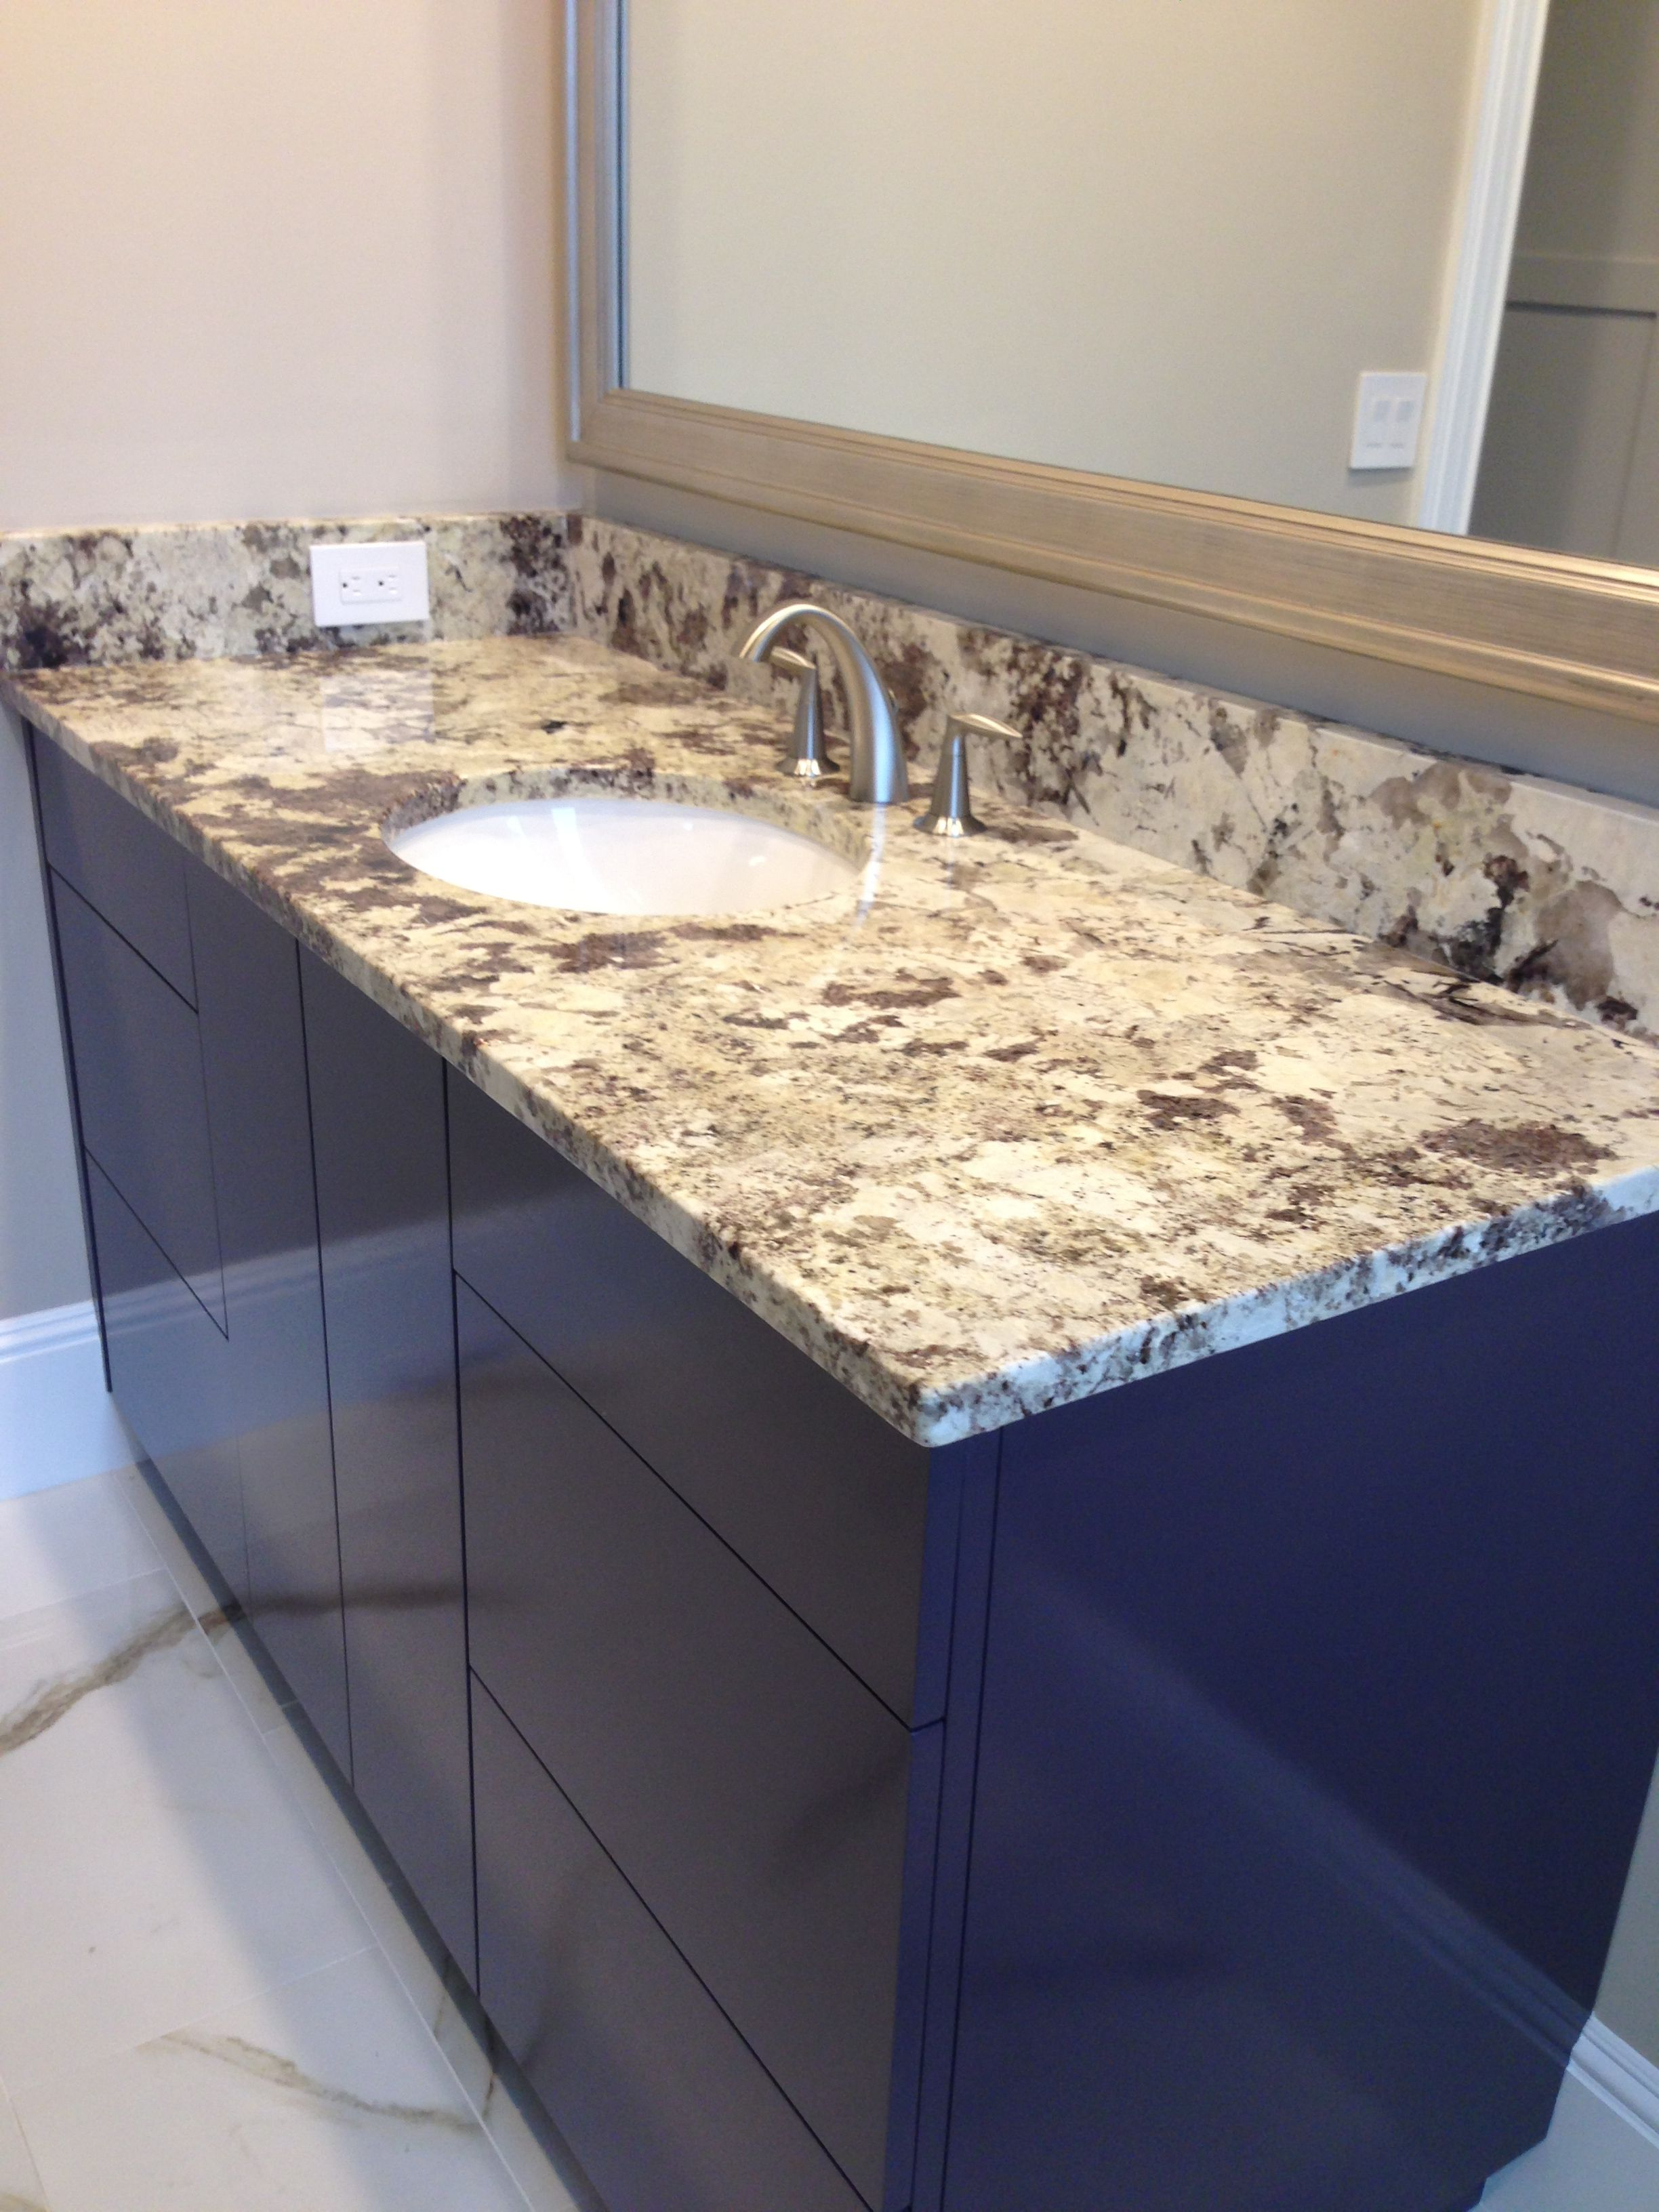 - White/Tan/Beige Bathroom Granite Countertops With Granite